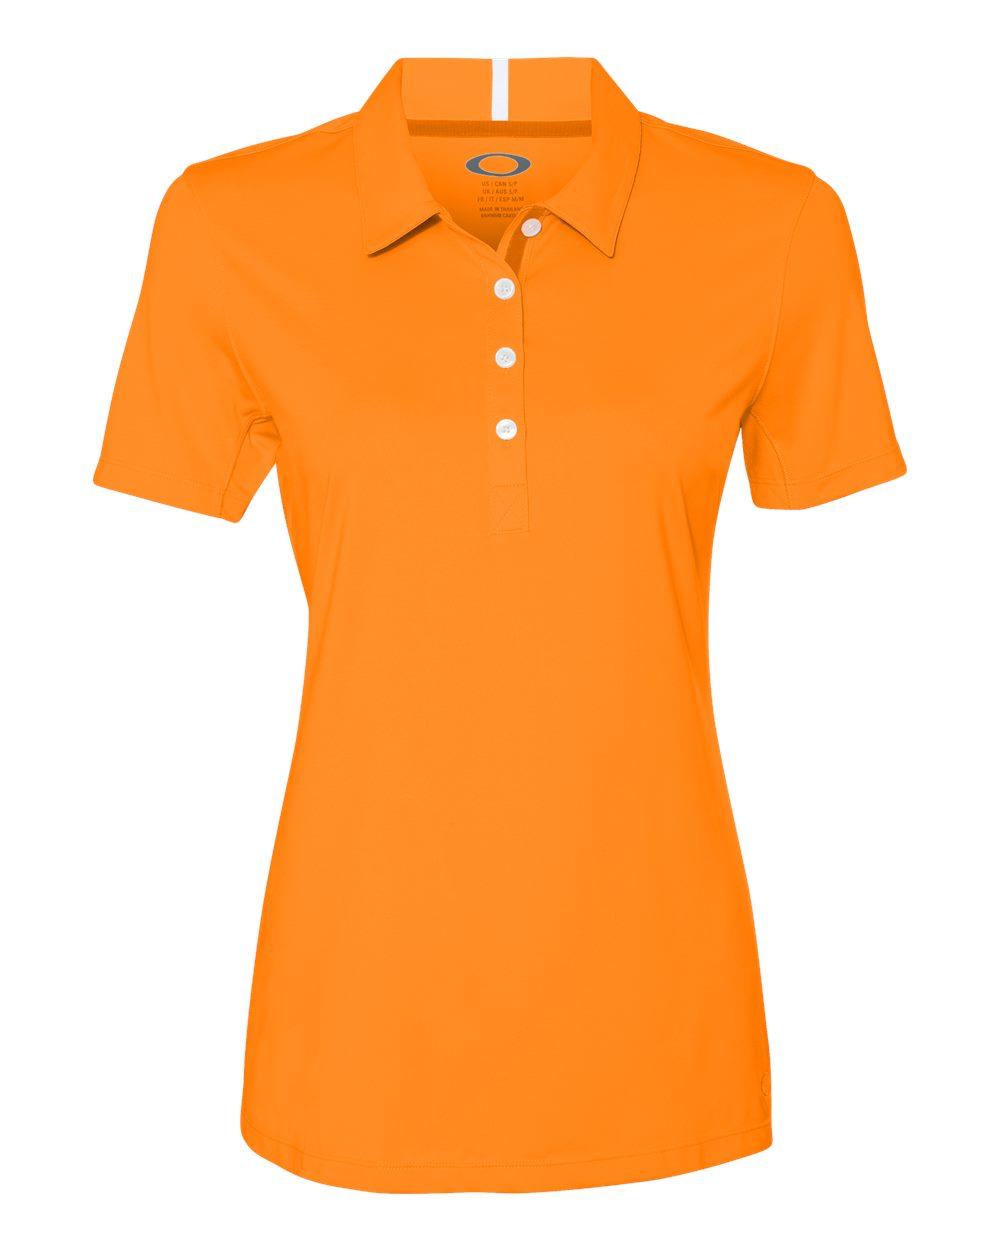 Oakley Orange Pop/White